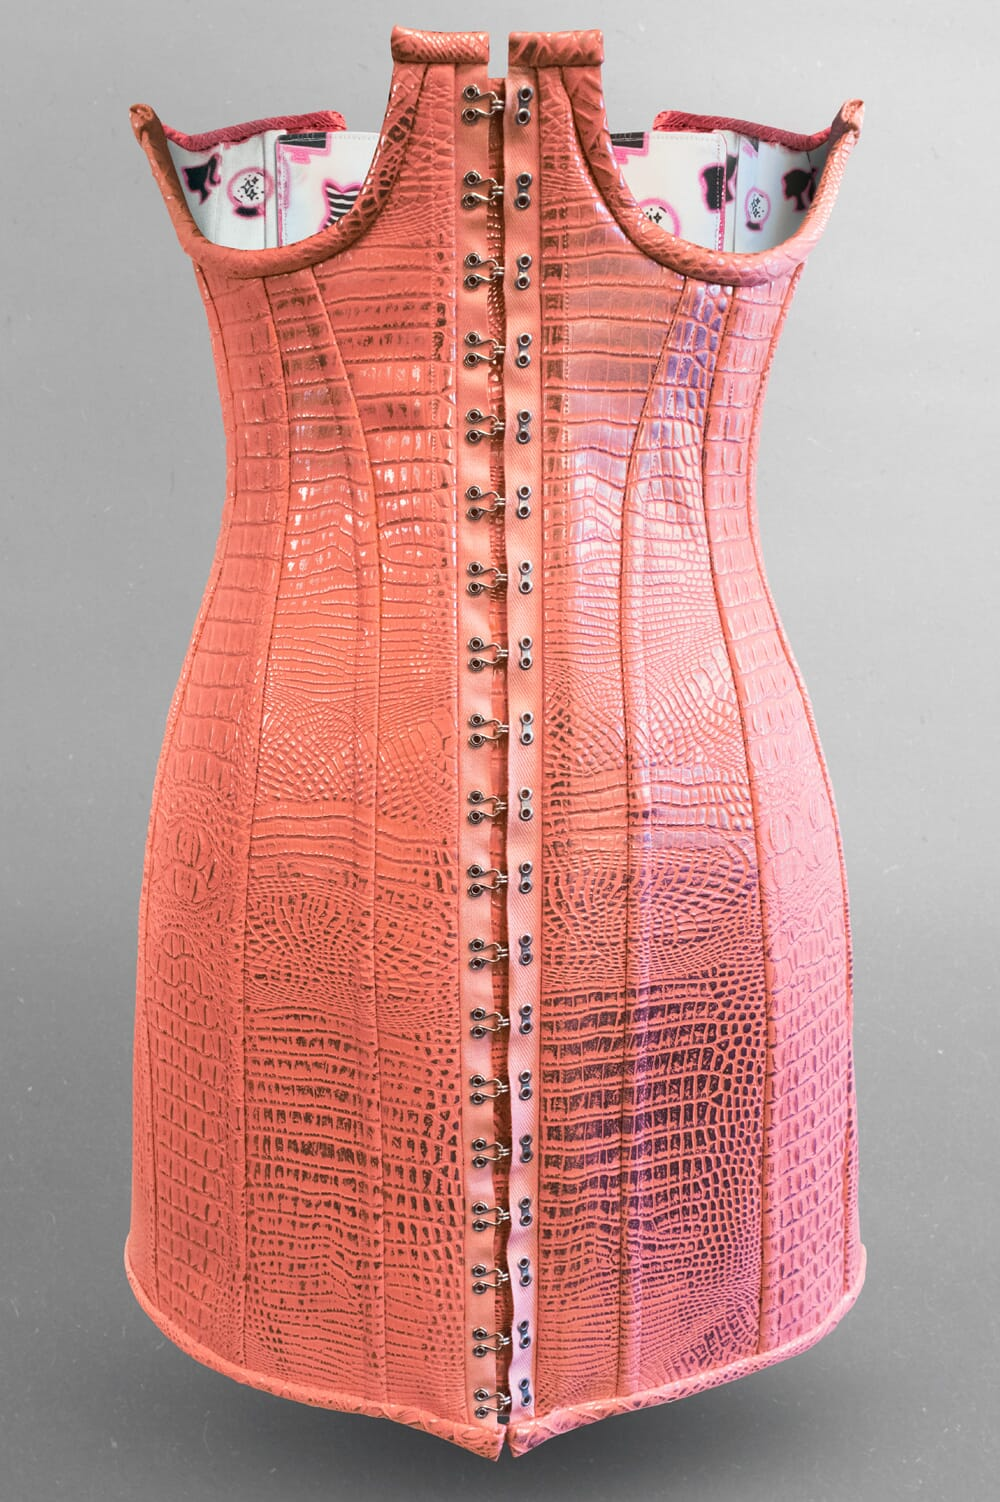 The Skinny Confidential Underbust Corset Dress